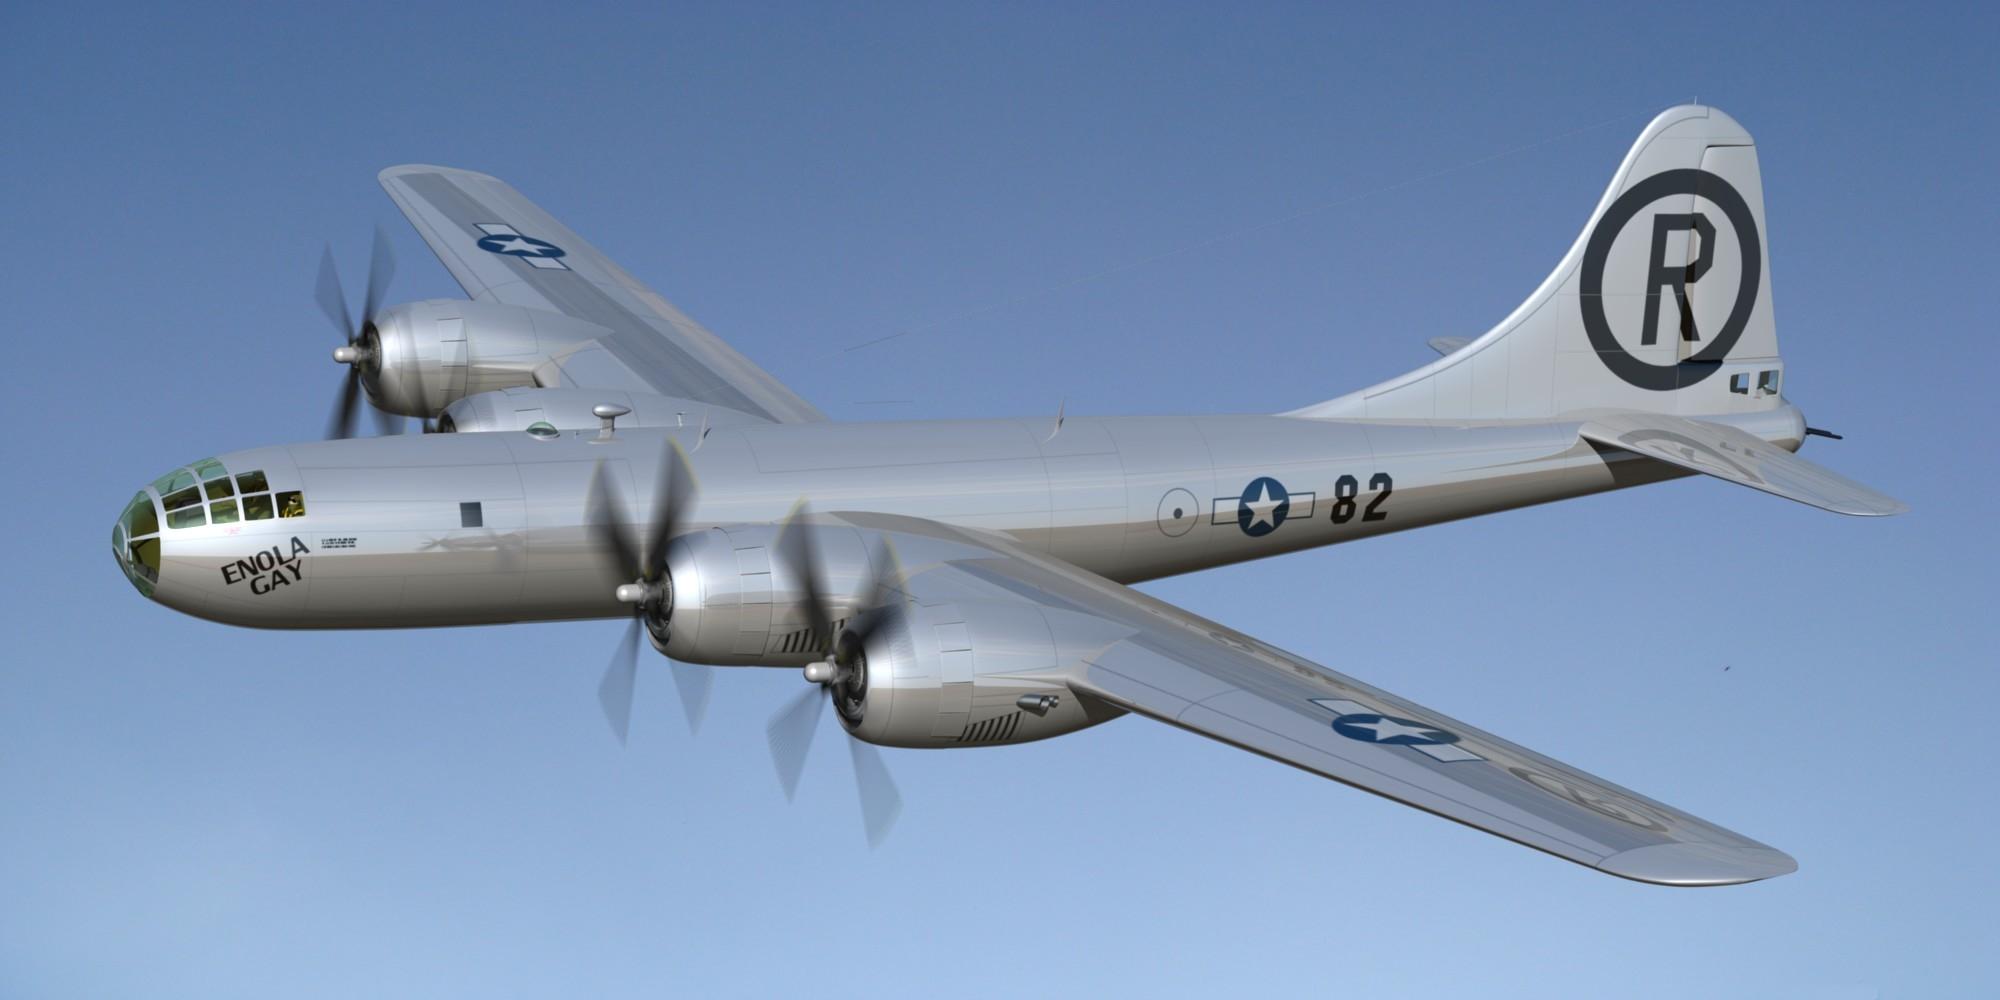 Enola Gay Airplane 120